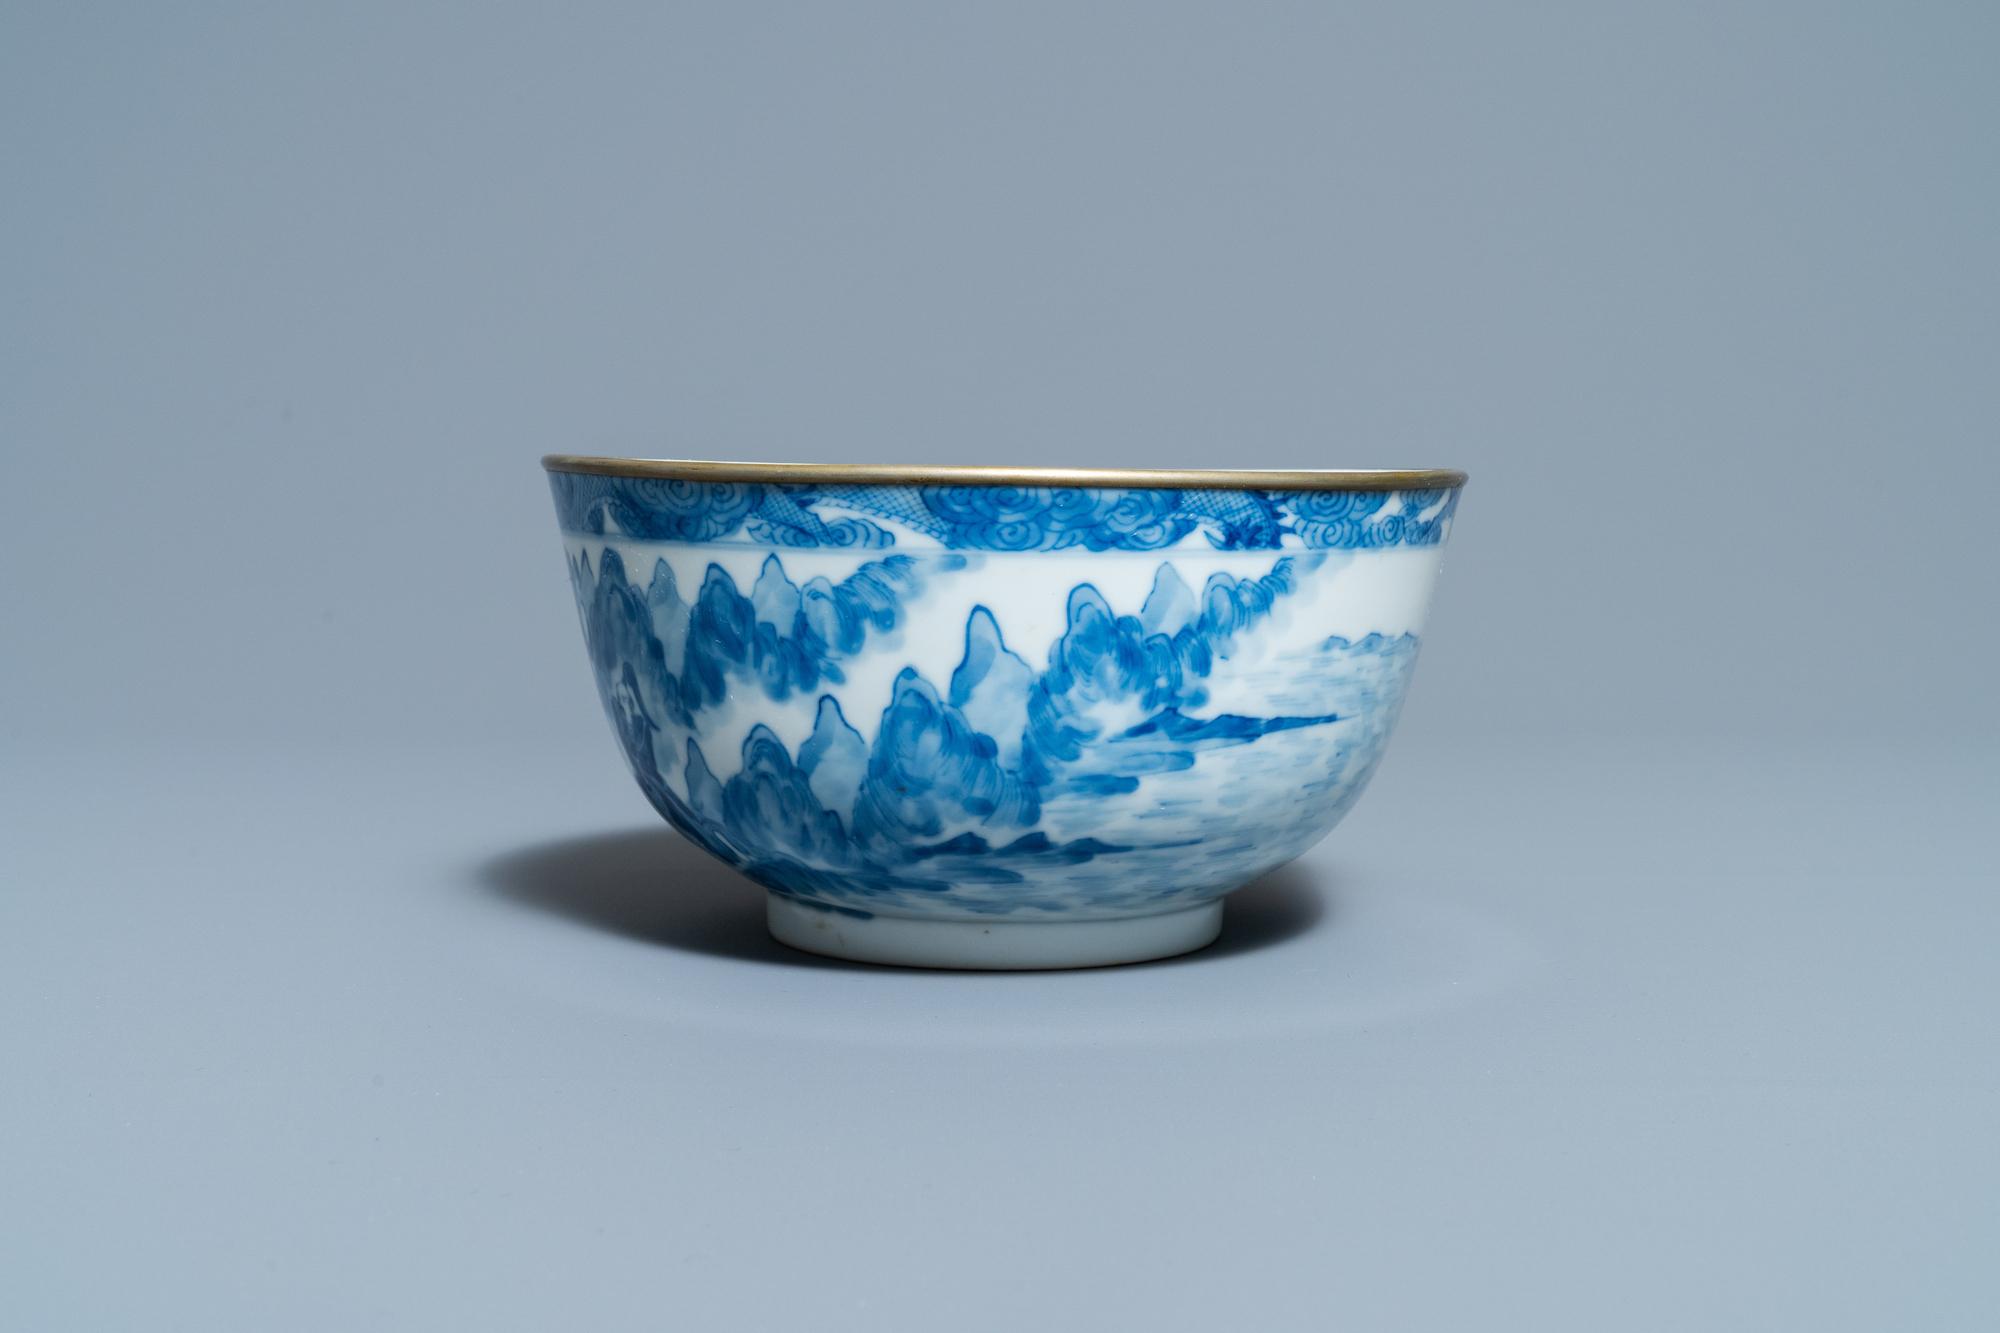 A Chinese blue and white Vietnamese market 'Bleu de Hue' bowl, Kangxi mark, 19th C. - Image 3 of 7